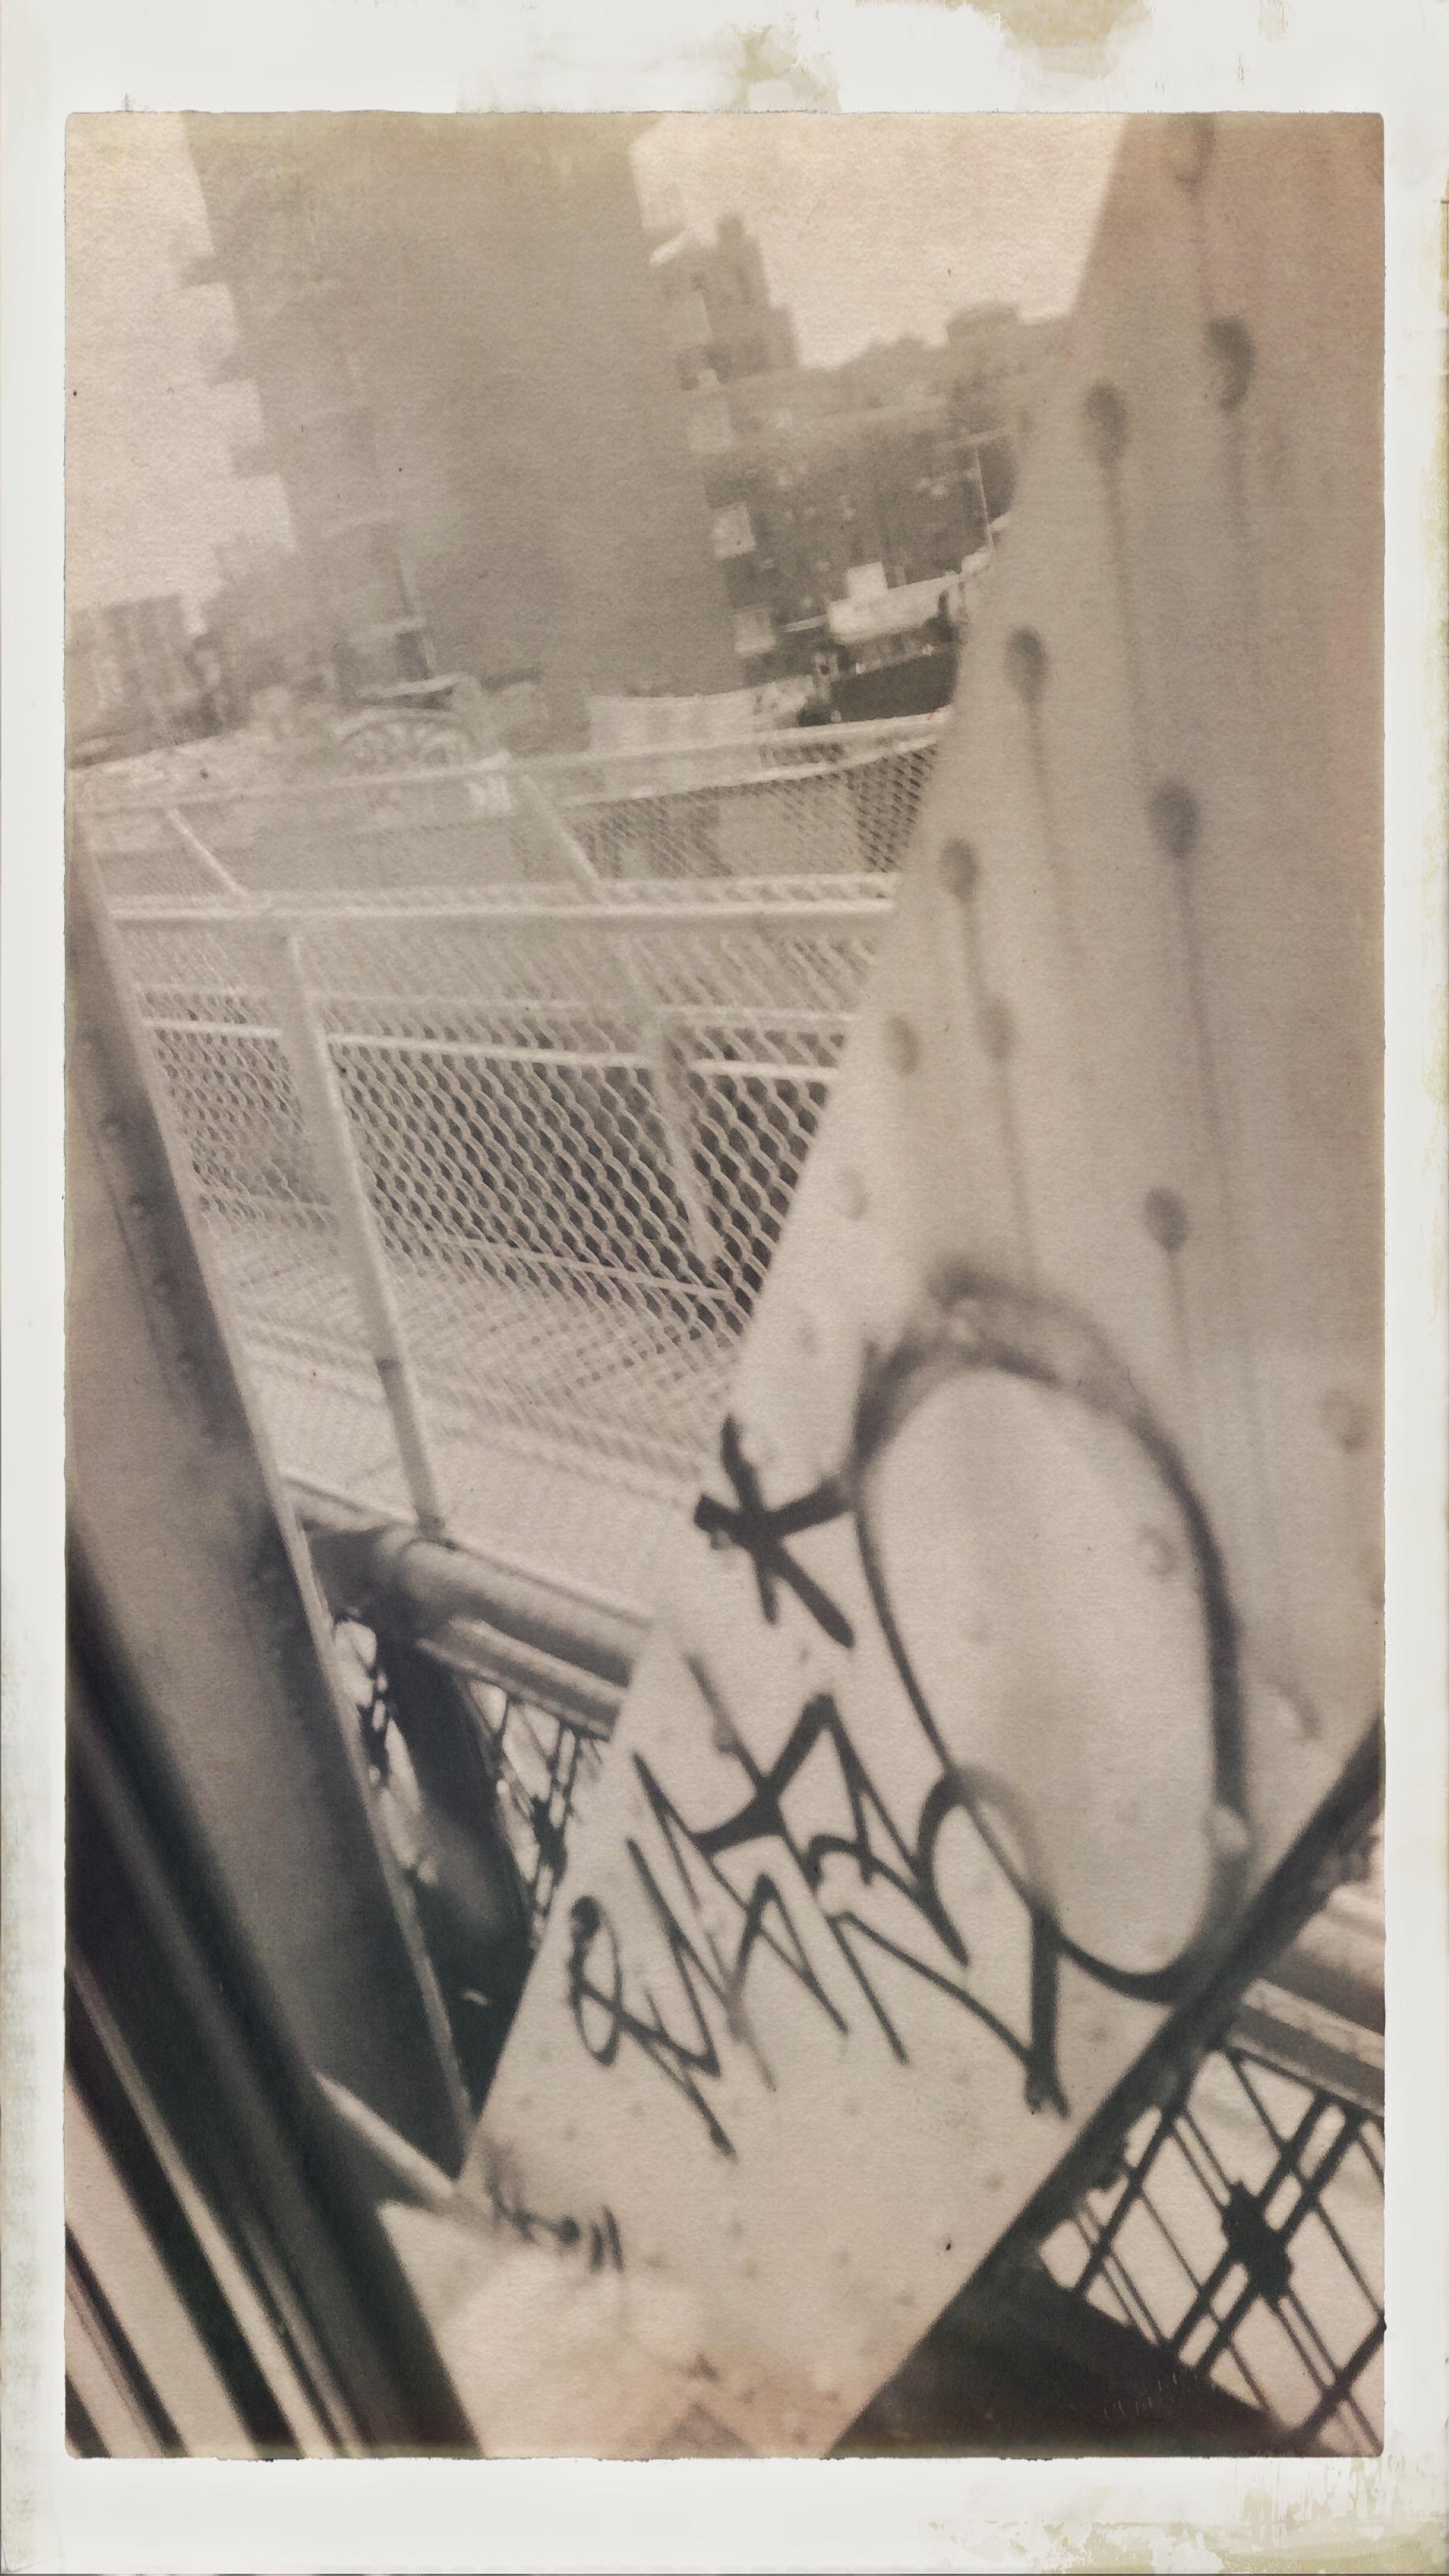 HipstamaticPhoto-516916036.569317.jpg